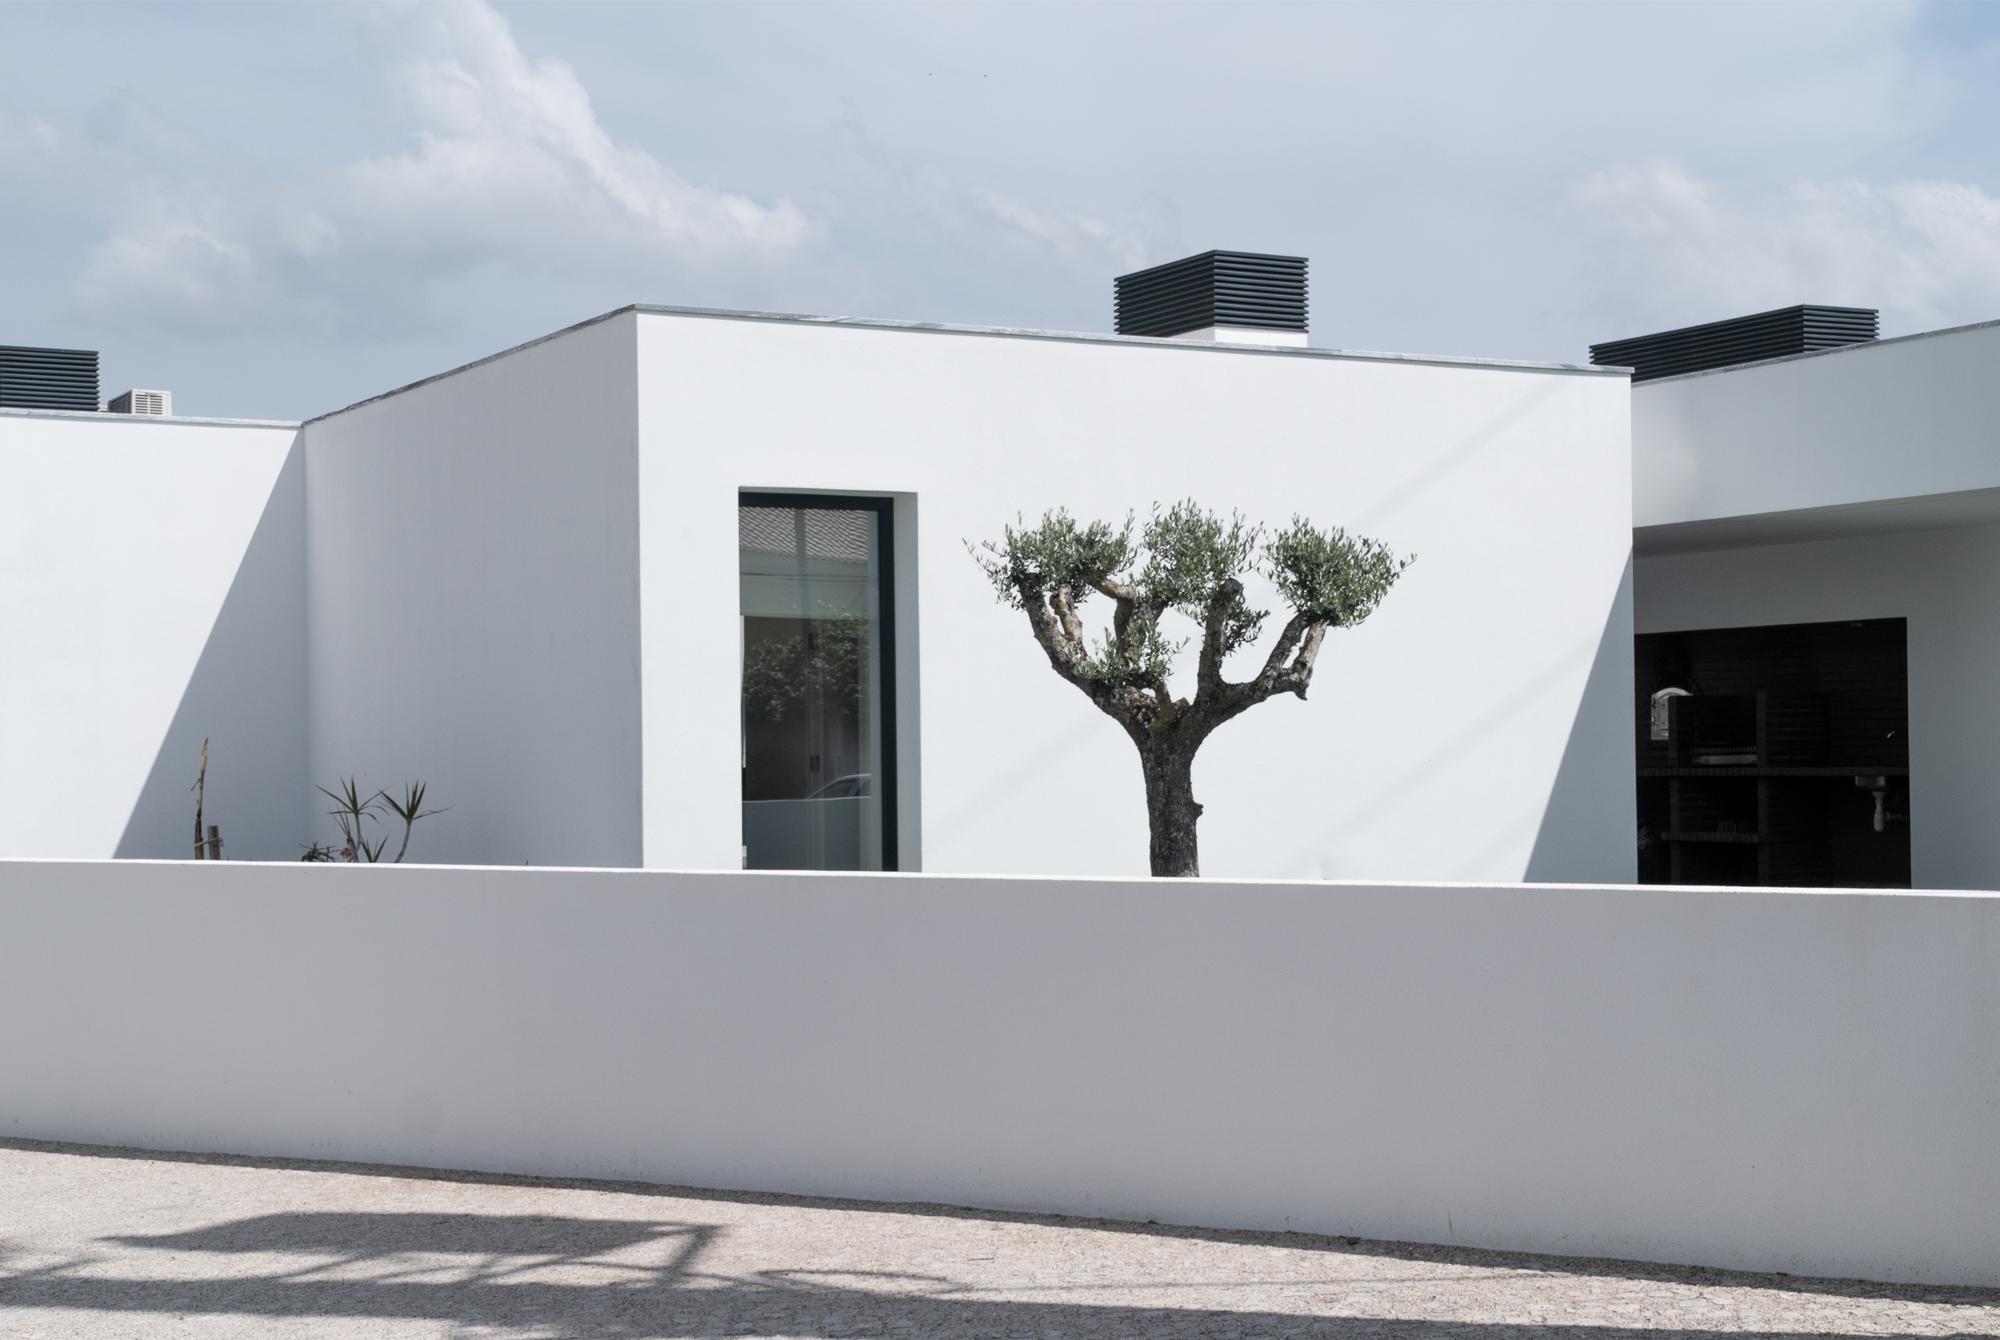 Arquitectura Arquitetura Arquitecto Arquiteto Casa Moradia Architecture Architect Sintra House Housing